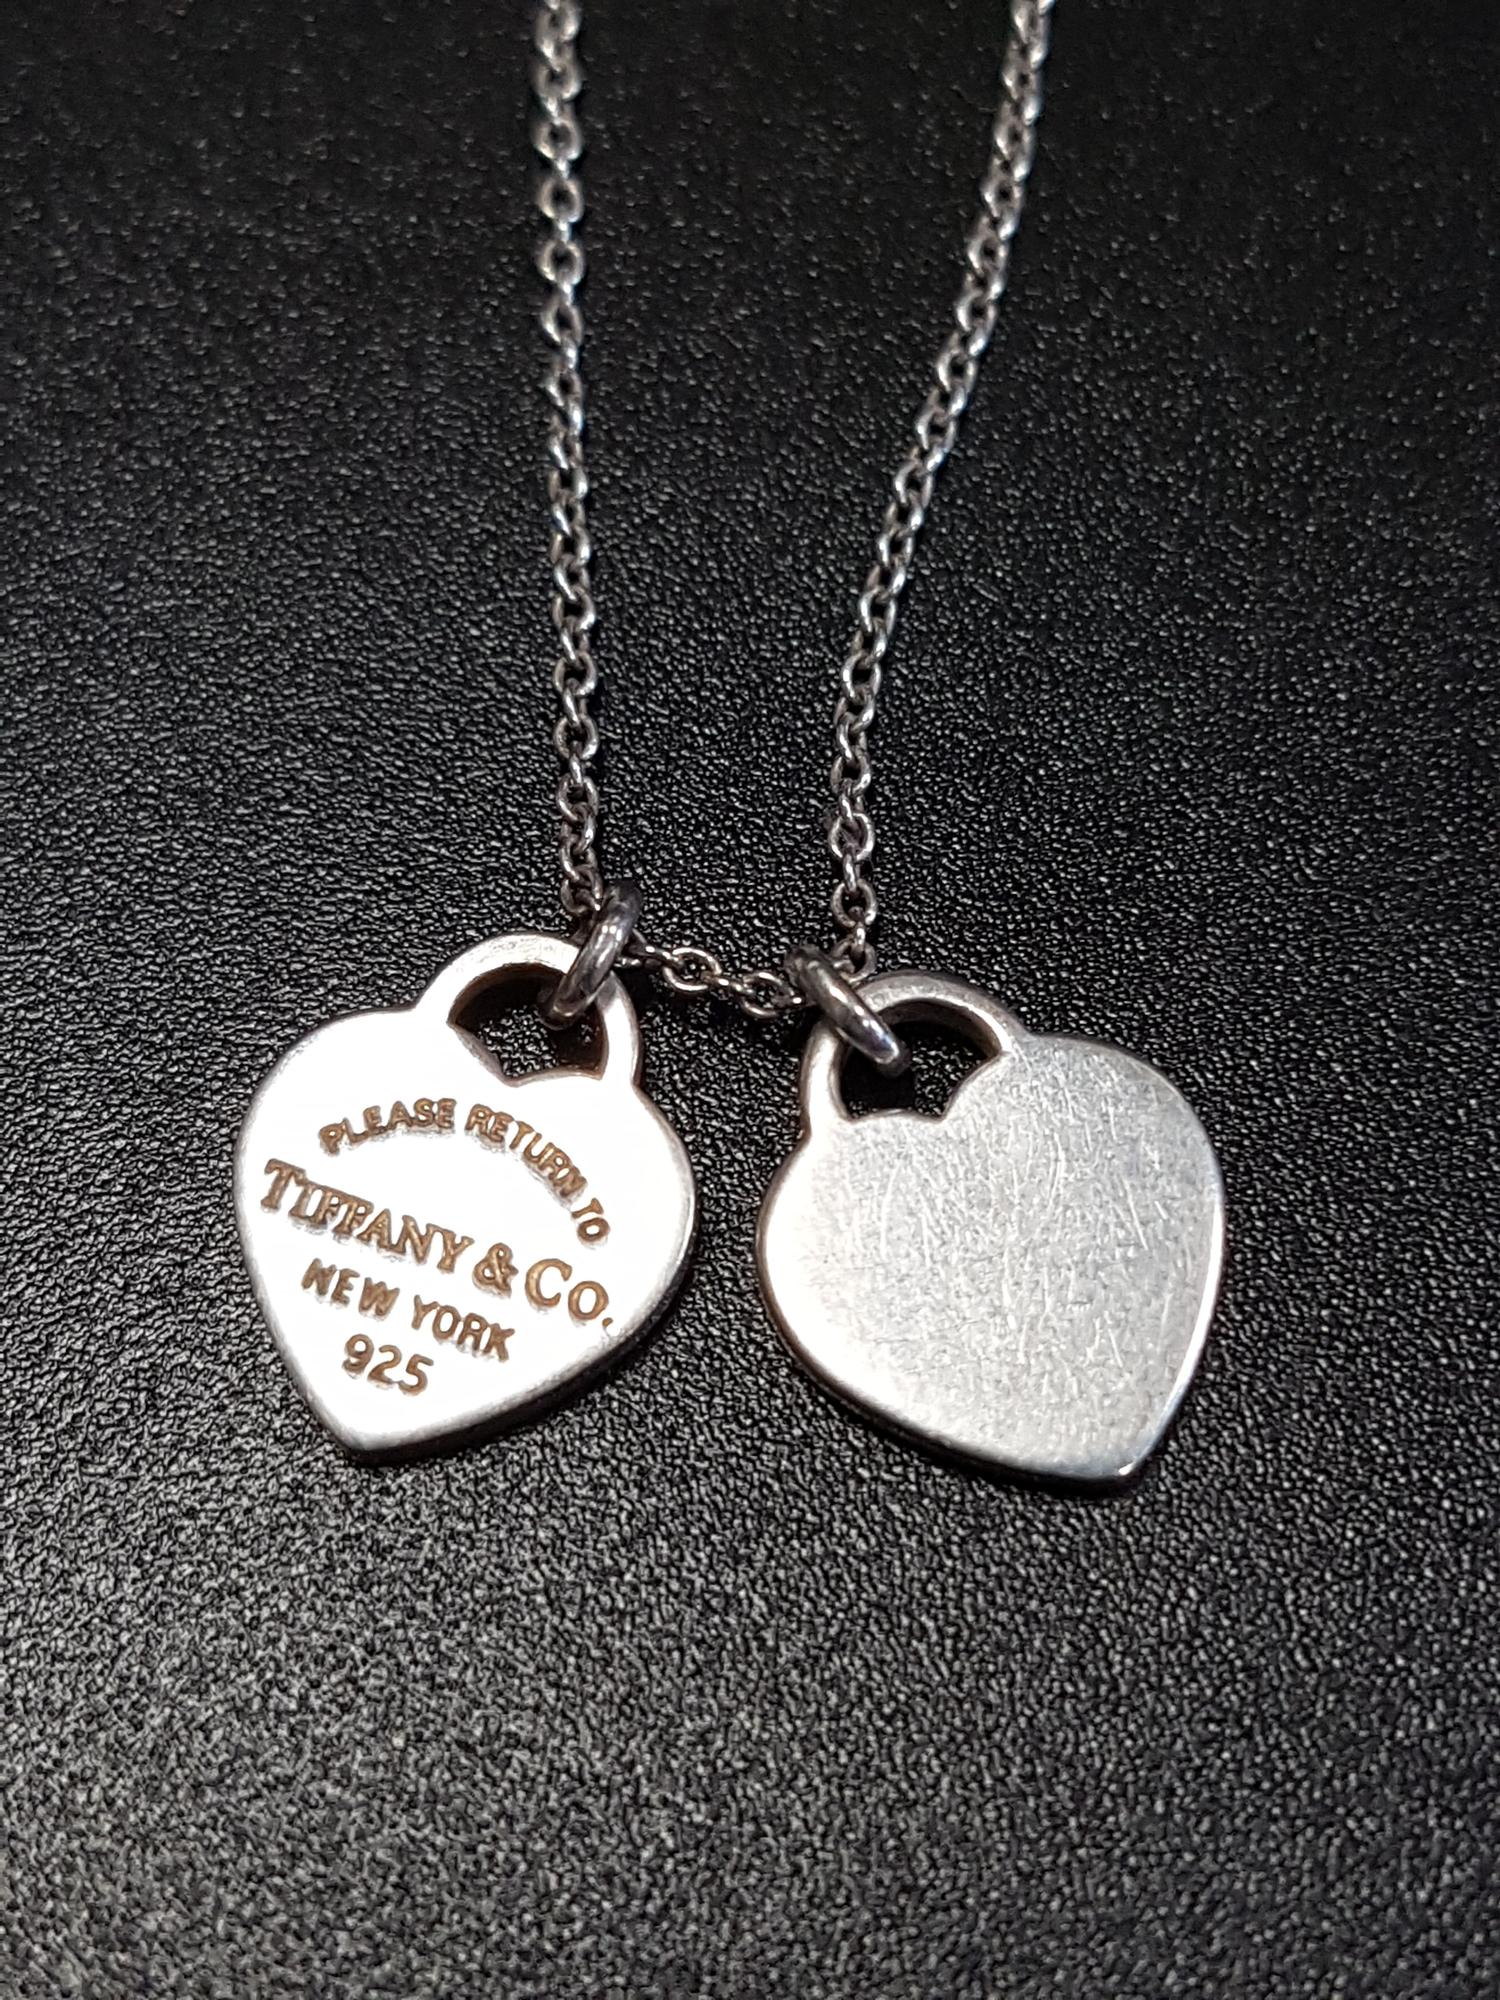 Lot 51 - TIFFANY & CO. 'RETURN TO TIFFANY' MINI DOUBLE HEART TAG SILVER PENDANT on silver Tiffany chain,